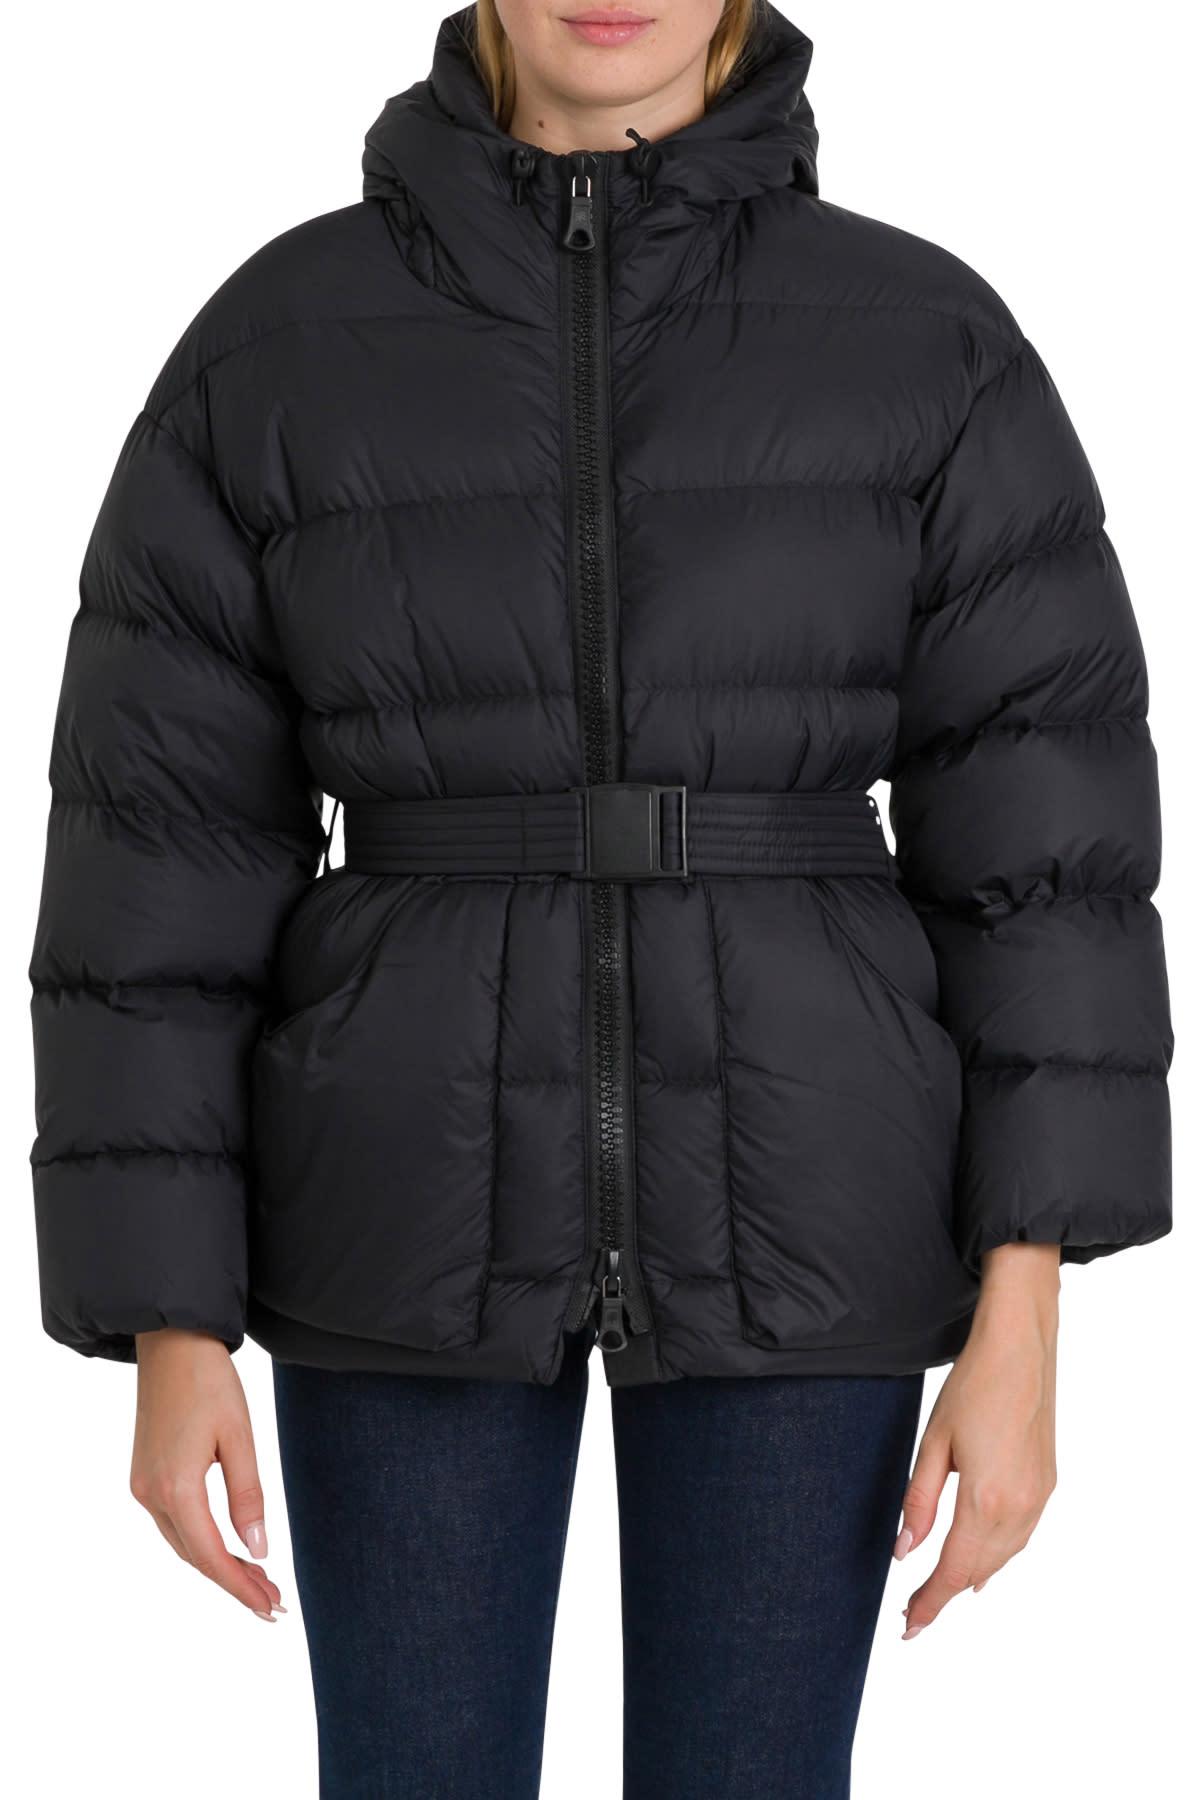 IENKI IENKI Belted Puffer Jacket Sheena